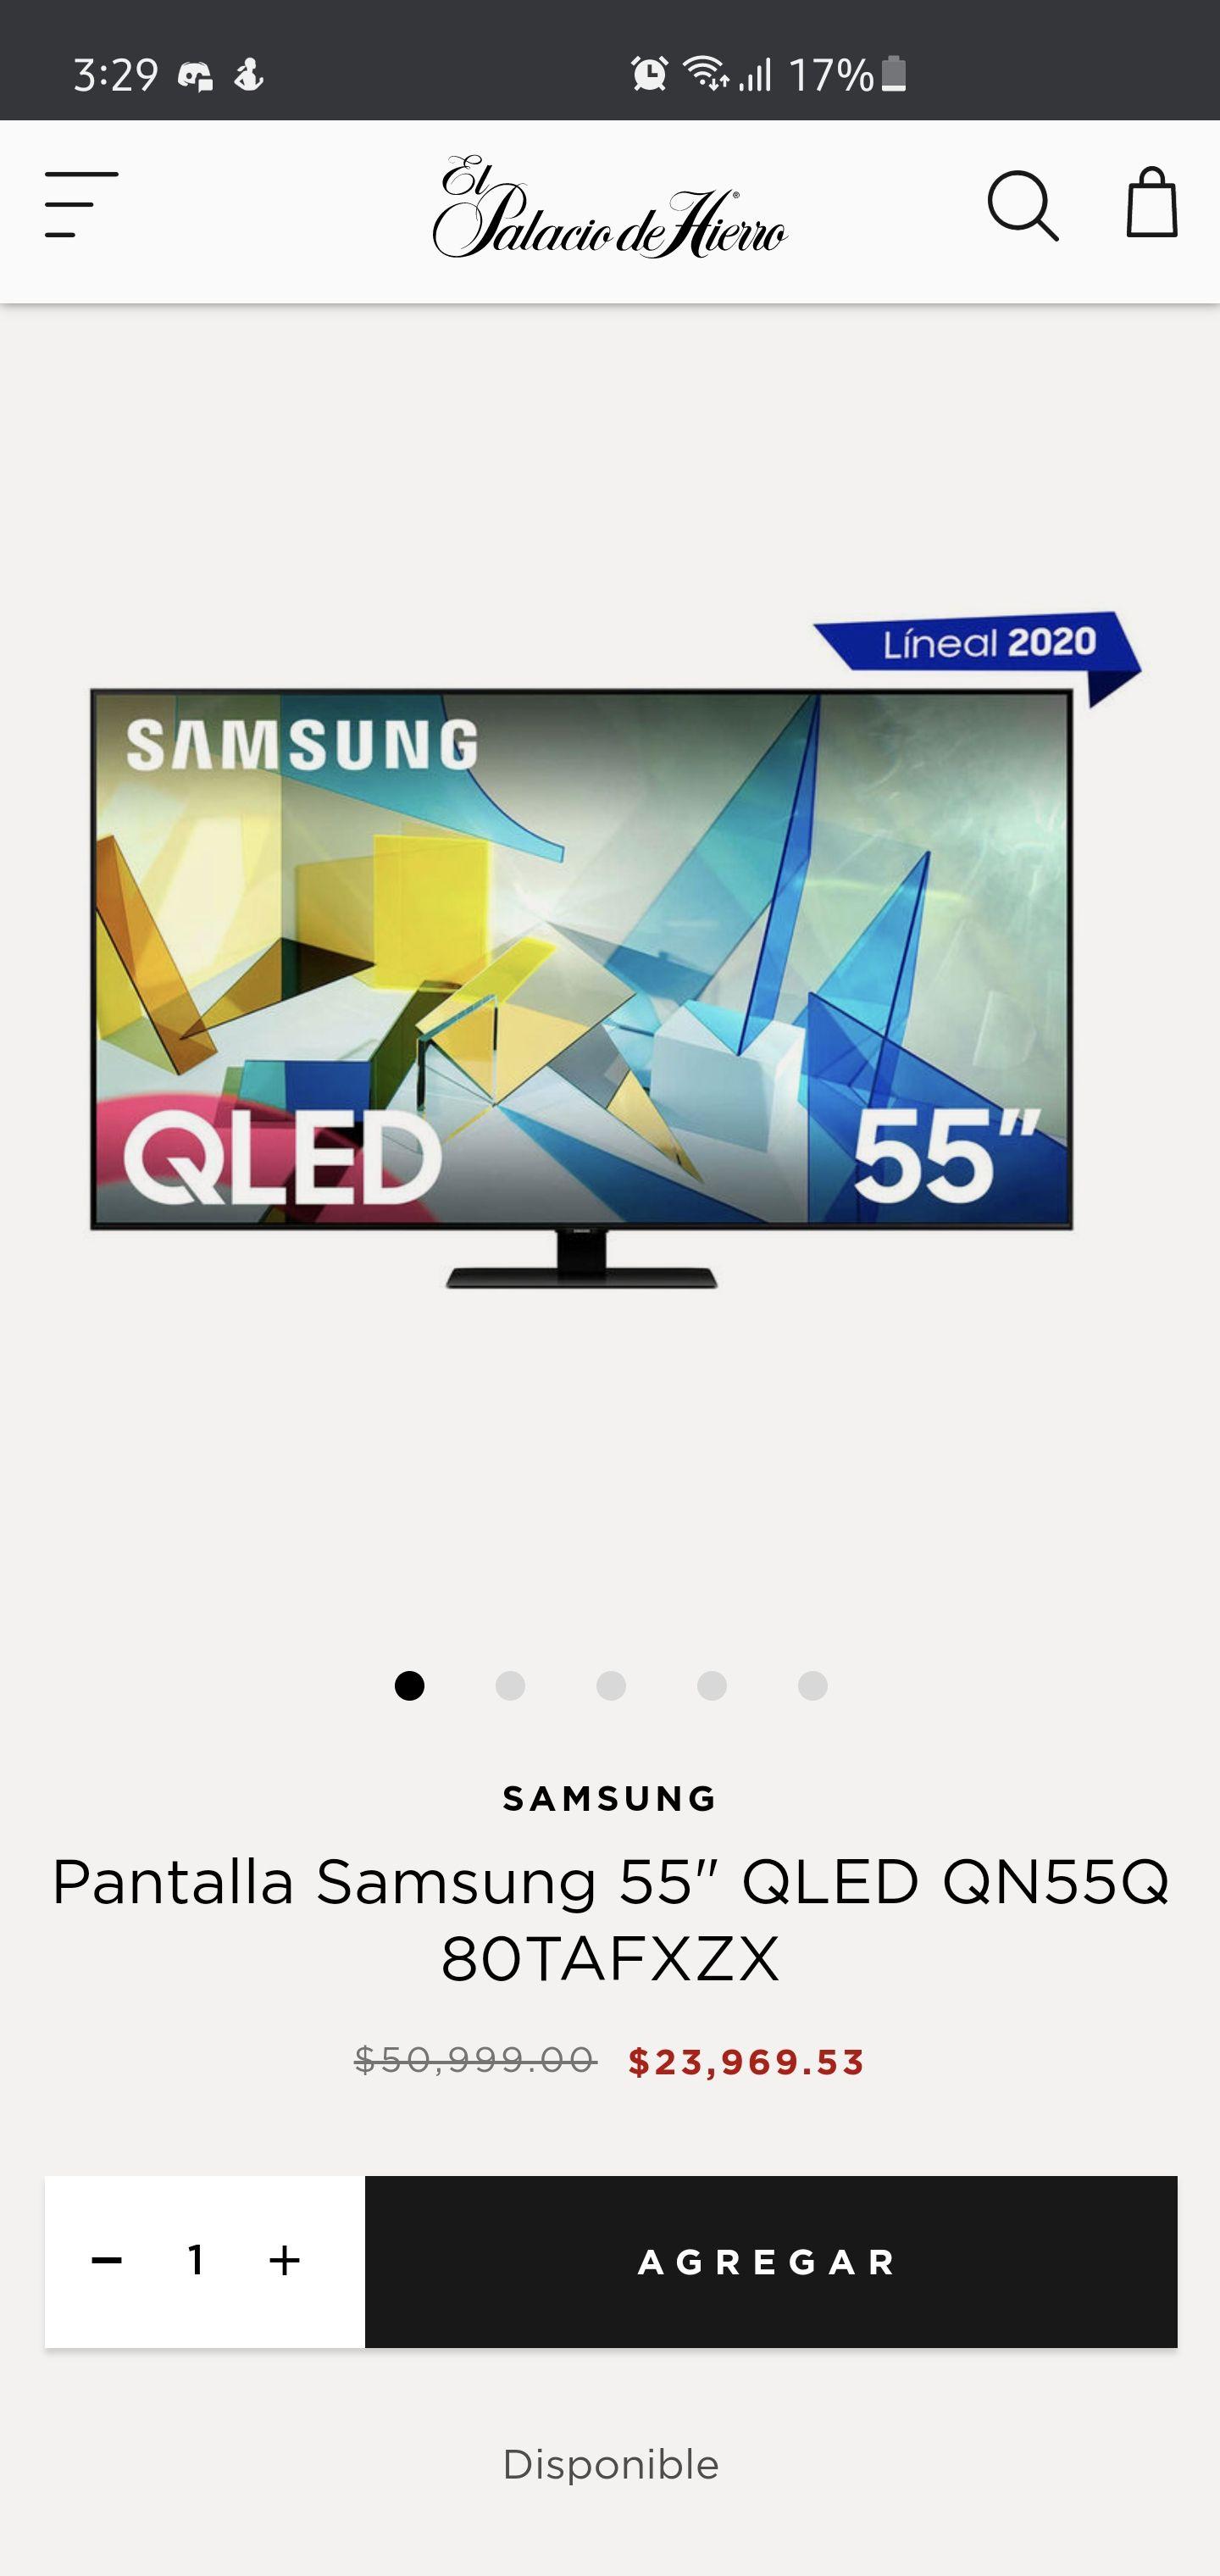 "Palacio de Hierro, Pantalla Qled Samsung 4K 55"" Q80T"